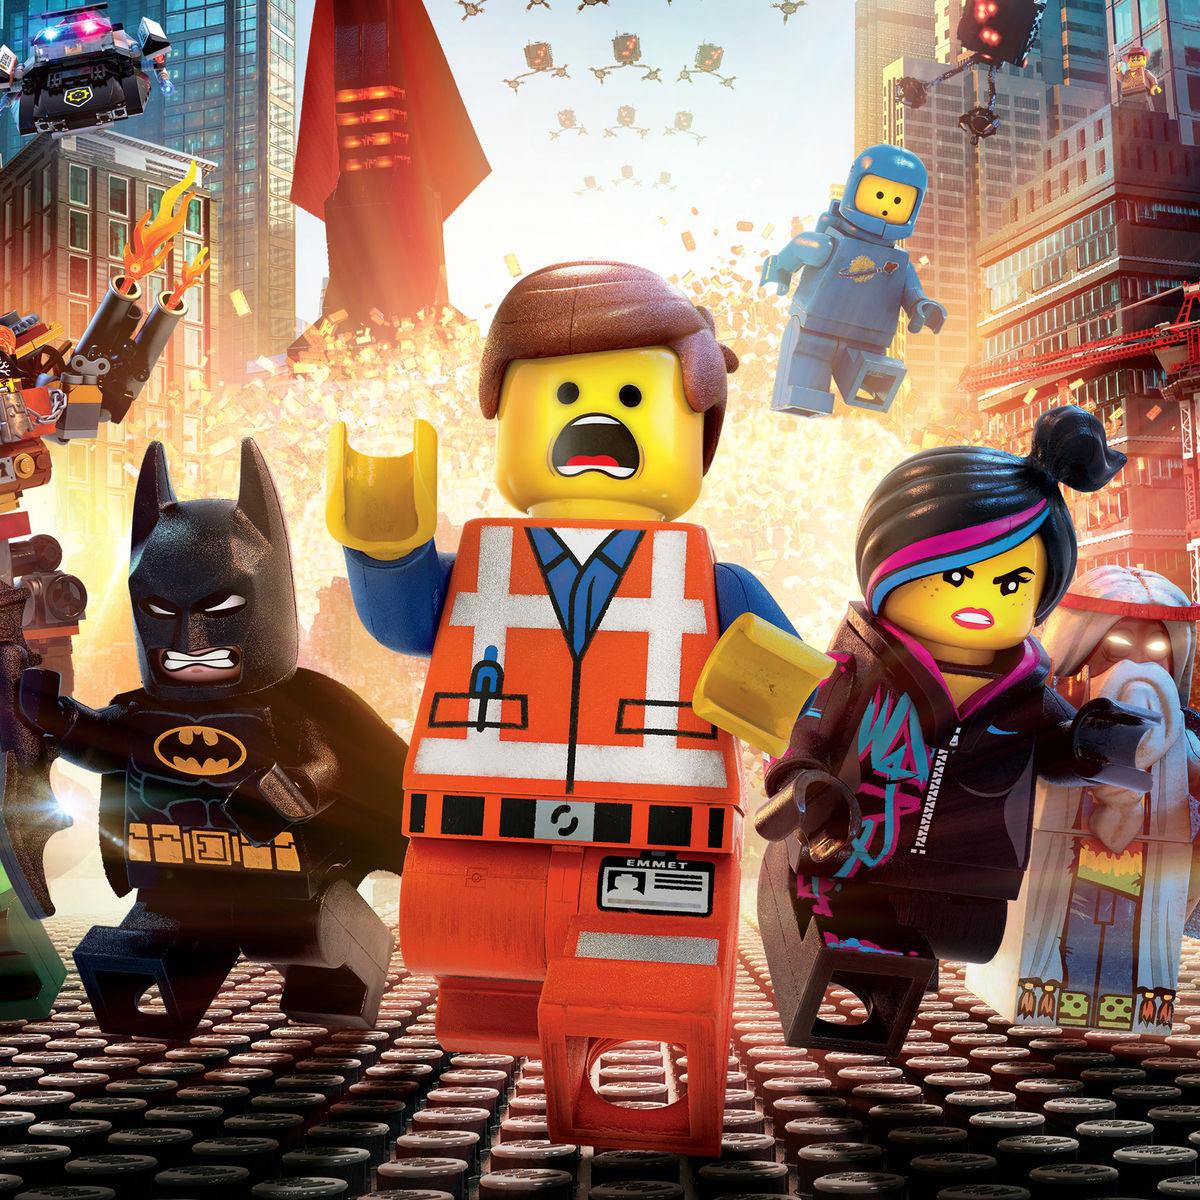 the_lego_movie_2014-wide_0.jpg